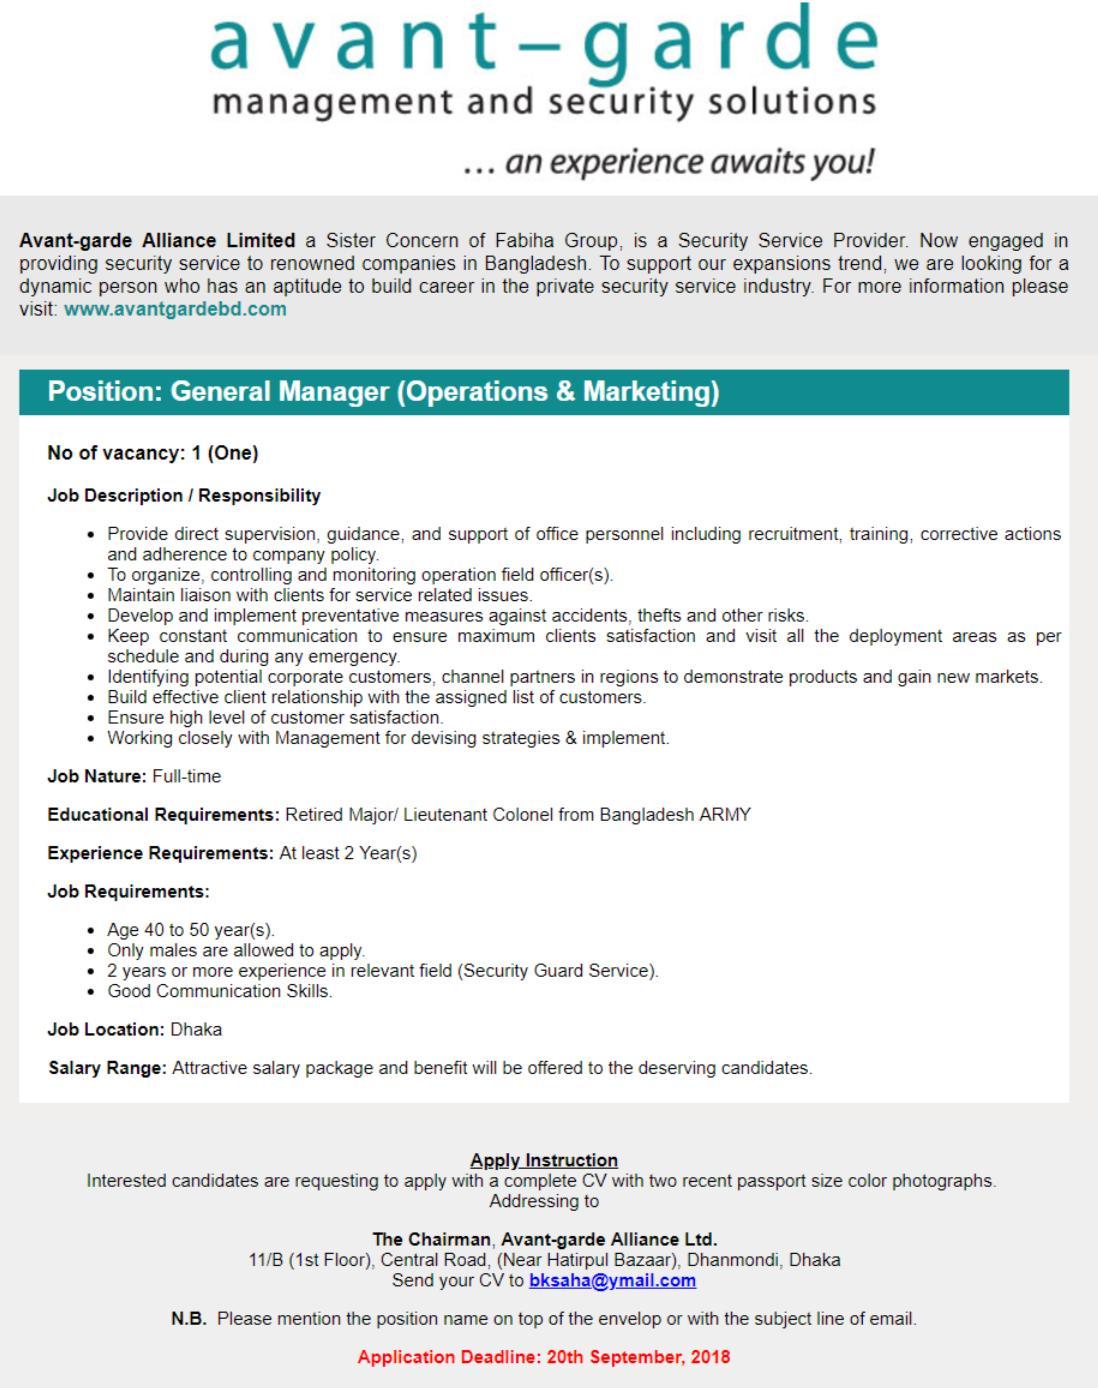 Avant-garde Alliance Ltd Job Circular